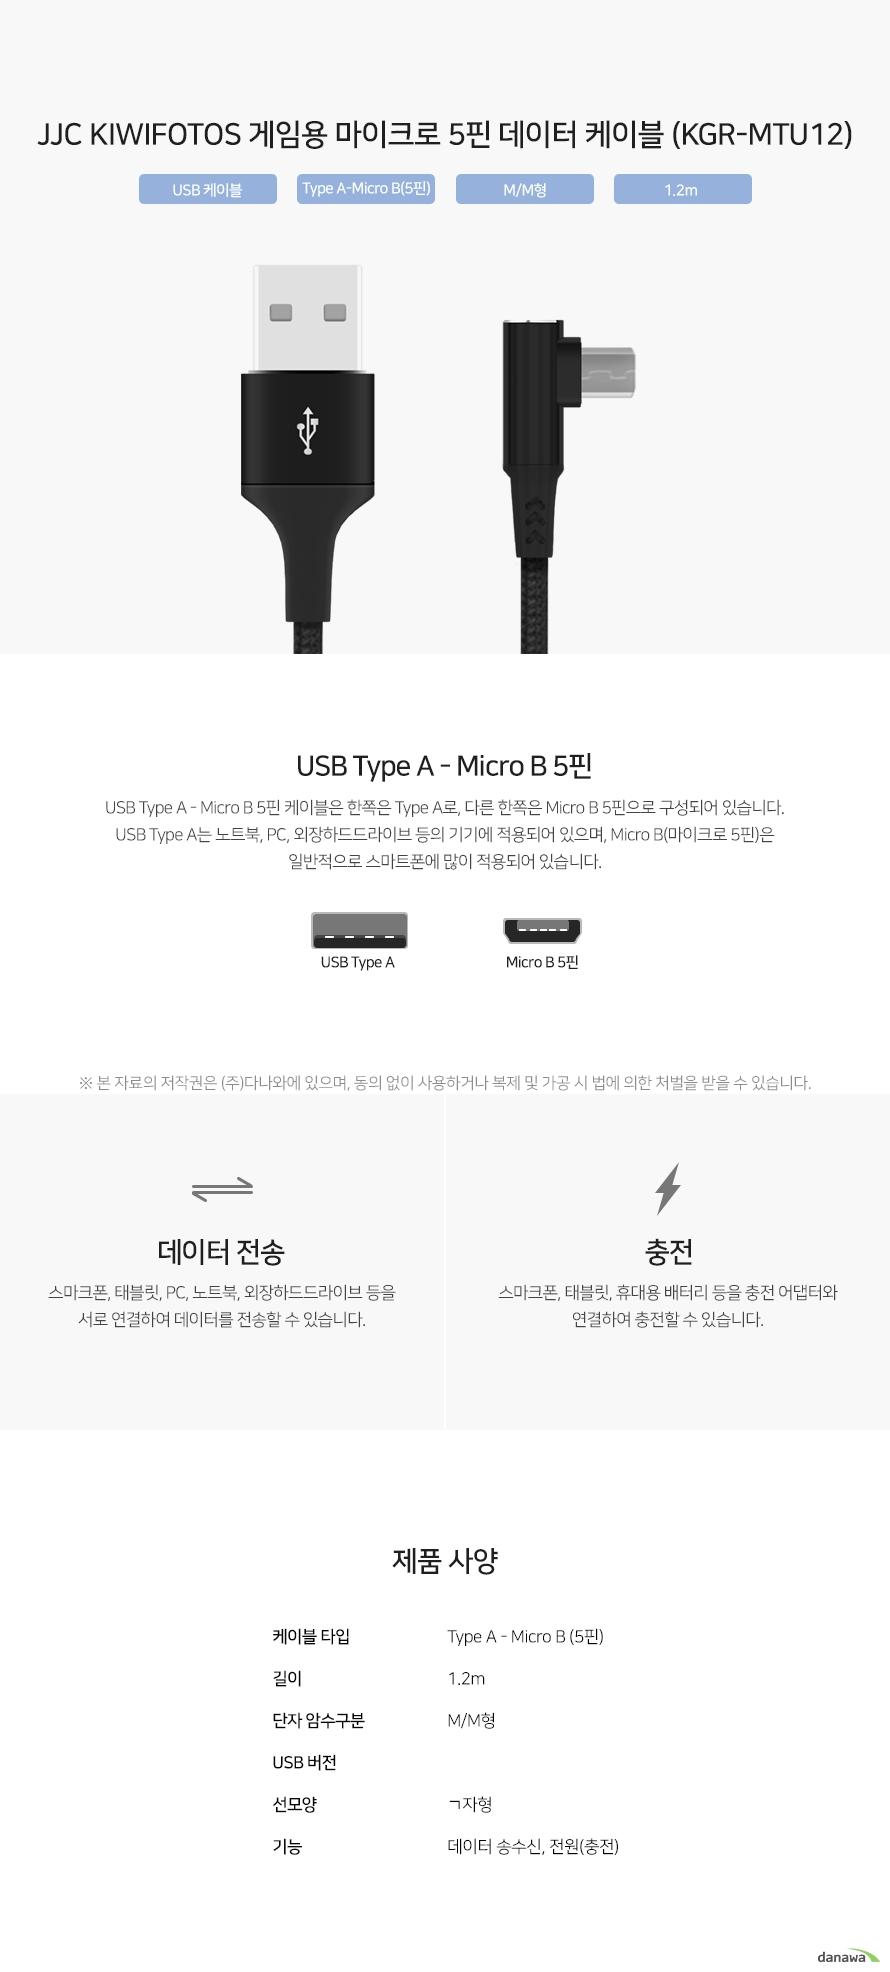 JJC KIWIFOTOS 게임용 마이크로 5핀 데이터 케이블 (KGR-MTU12) USB Type A - Micro B 5핀 케이블은 한쪽은 Type A로, 다른 한쪽은 Micro B 5핀으로 구성되어 있습니다. USB Type A는 노트북, PC, 외장하드드라이브 등의 기기에 적용되어 있으며, Micro B(마이크로 5핀)은 일반적으로 스마트폰에 많이 적용되어 있습니다. 스마크폰, 태블릿, PC, 노트북, 외장하드드라이브 등을 서로 연결하여 데이터를 전송할 수 있습니다. 스마크폰, 태블릿, 휴대용 배터리 등을 충전 어댑터와 연결하여 충전할 수 있습니다.